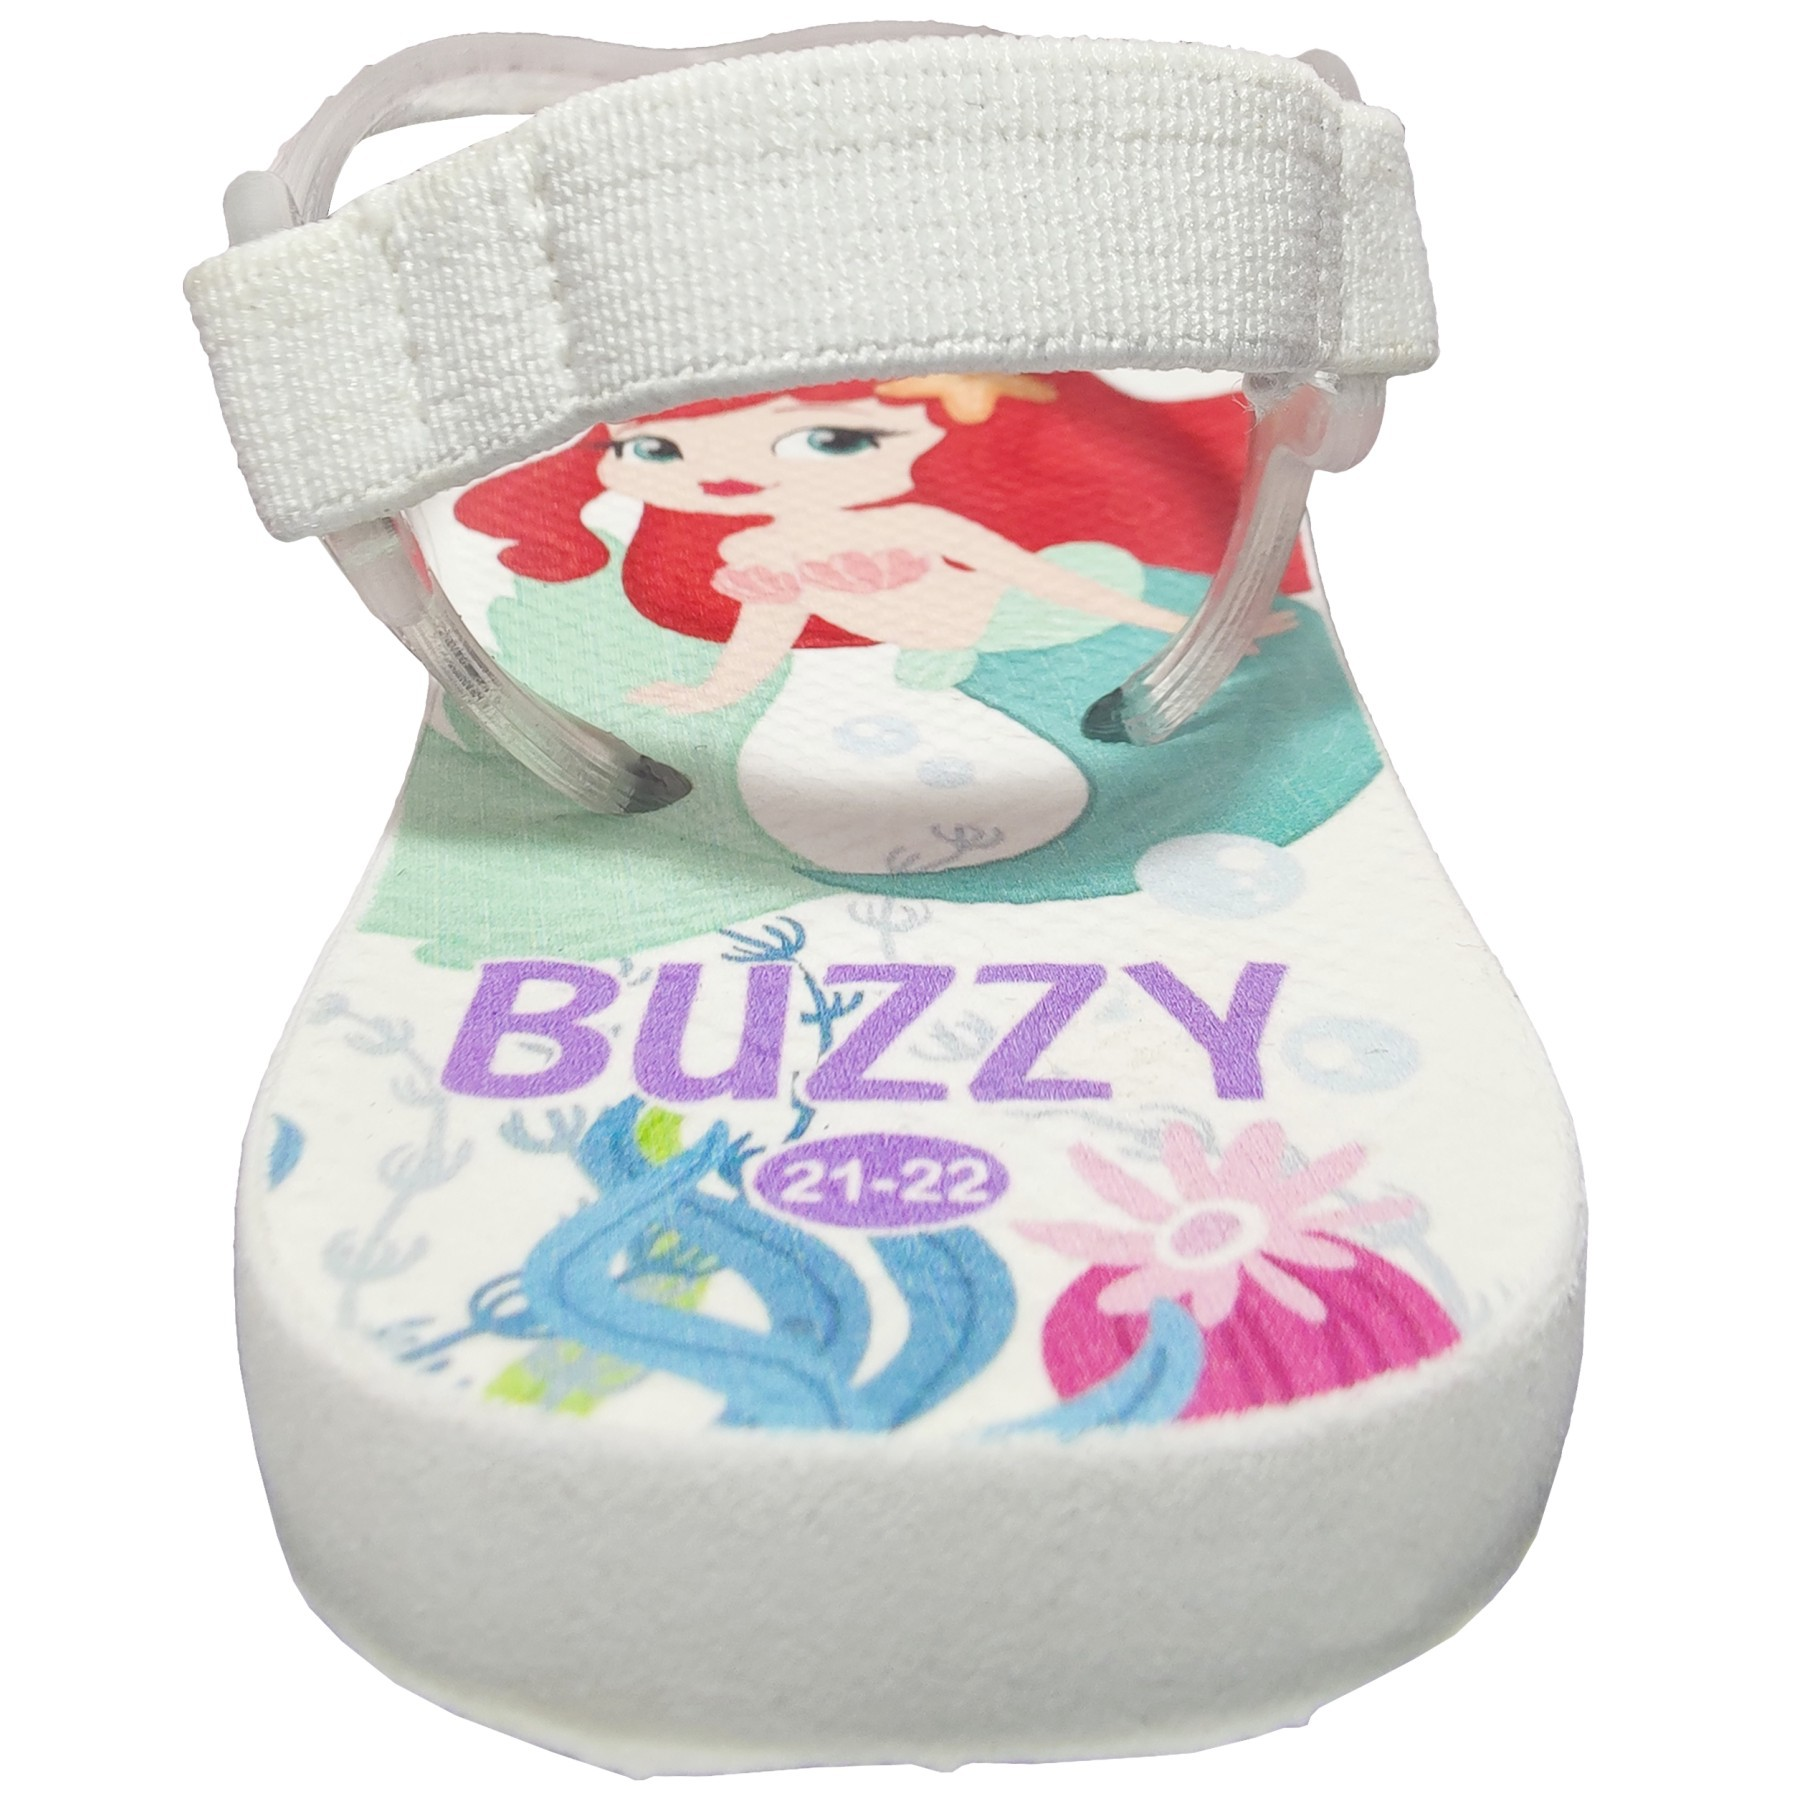 Chinelo Bebê Buzzy Sandália Infantil Sereia Fofa Bebê Menina BZ28